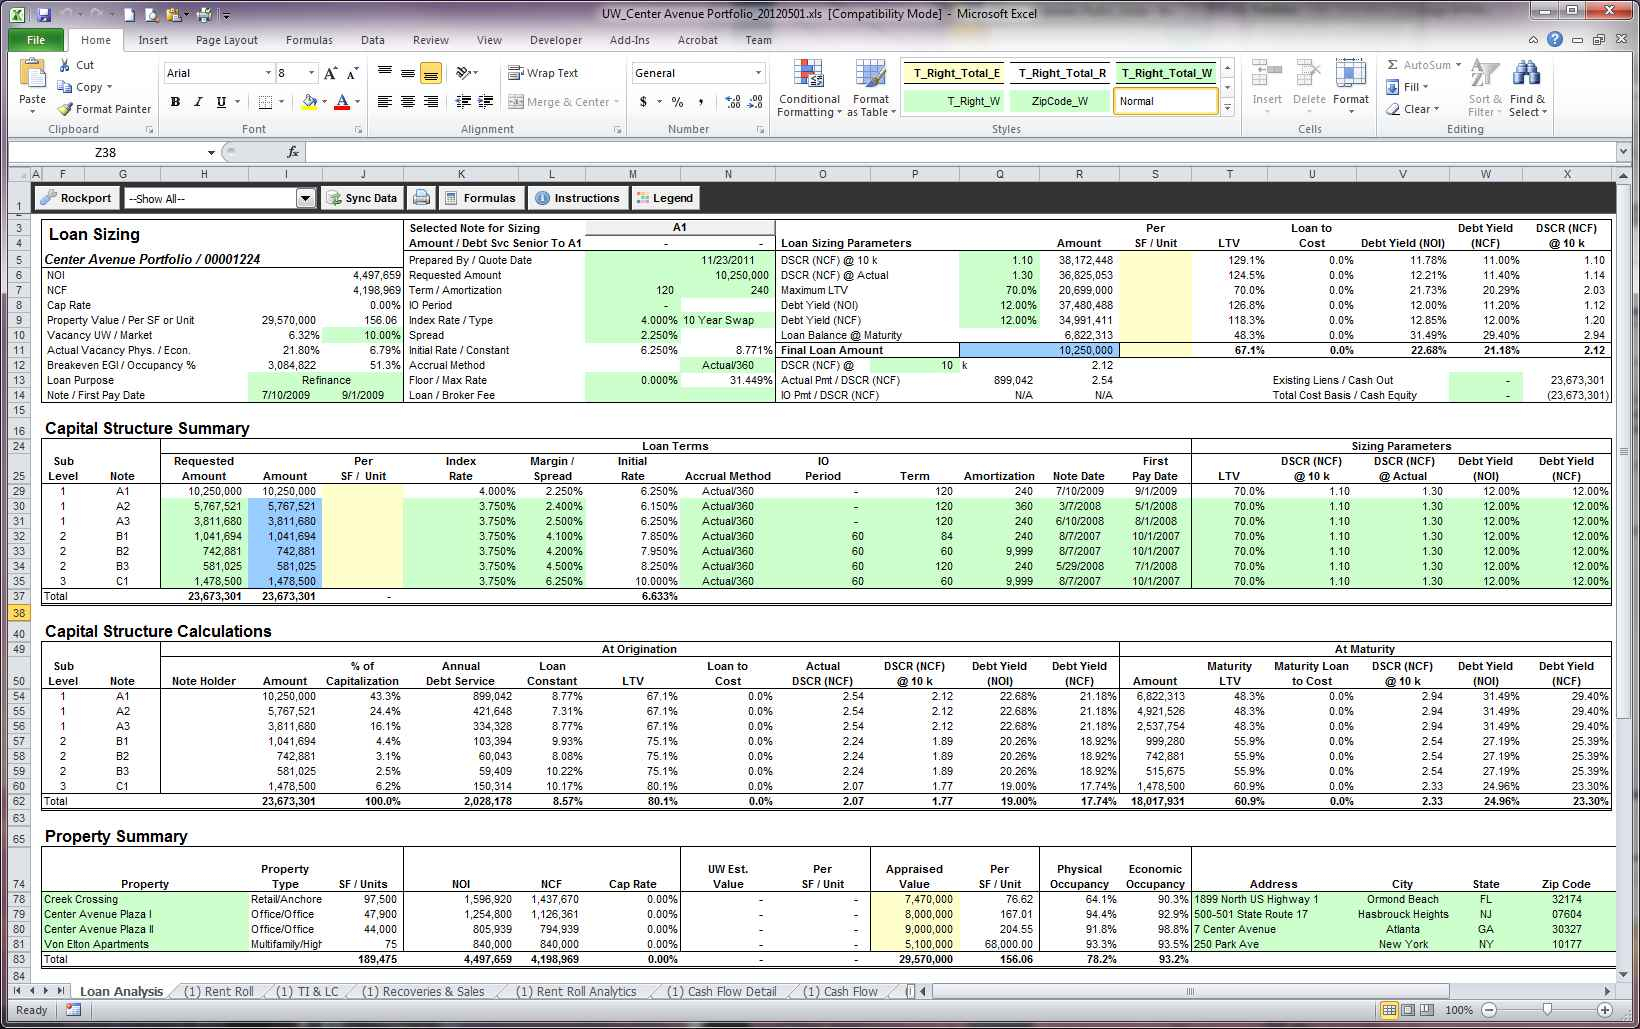 Download Spreadsheet App Regarding Property Management Spreadsheet Free Download  Aljererlotgd